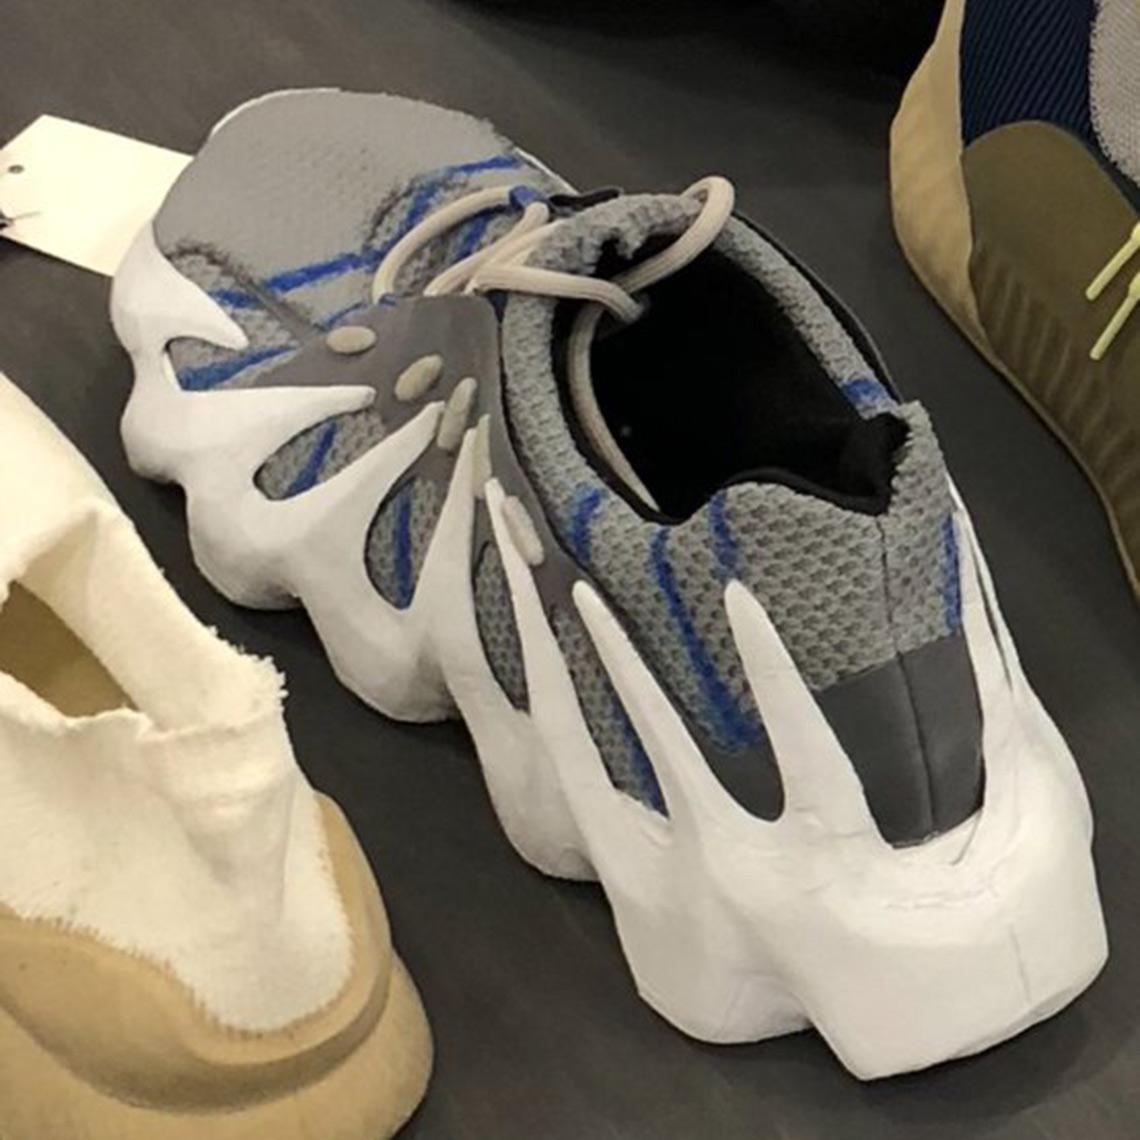 low priced af4bd 44eb1 Adidas Yeezy 700 V2 Static EF2829 Release Date Sneaker